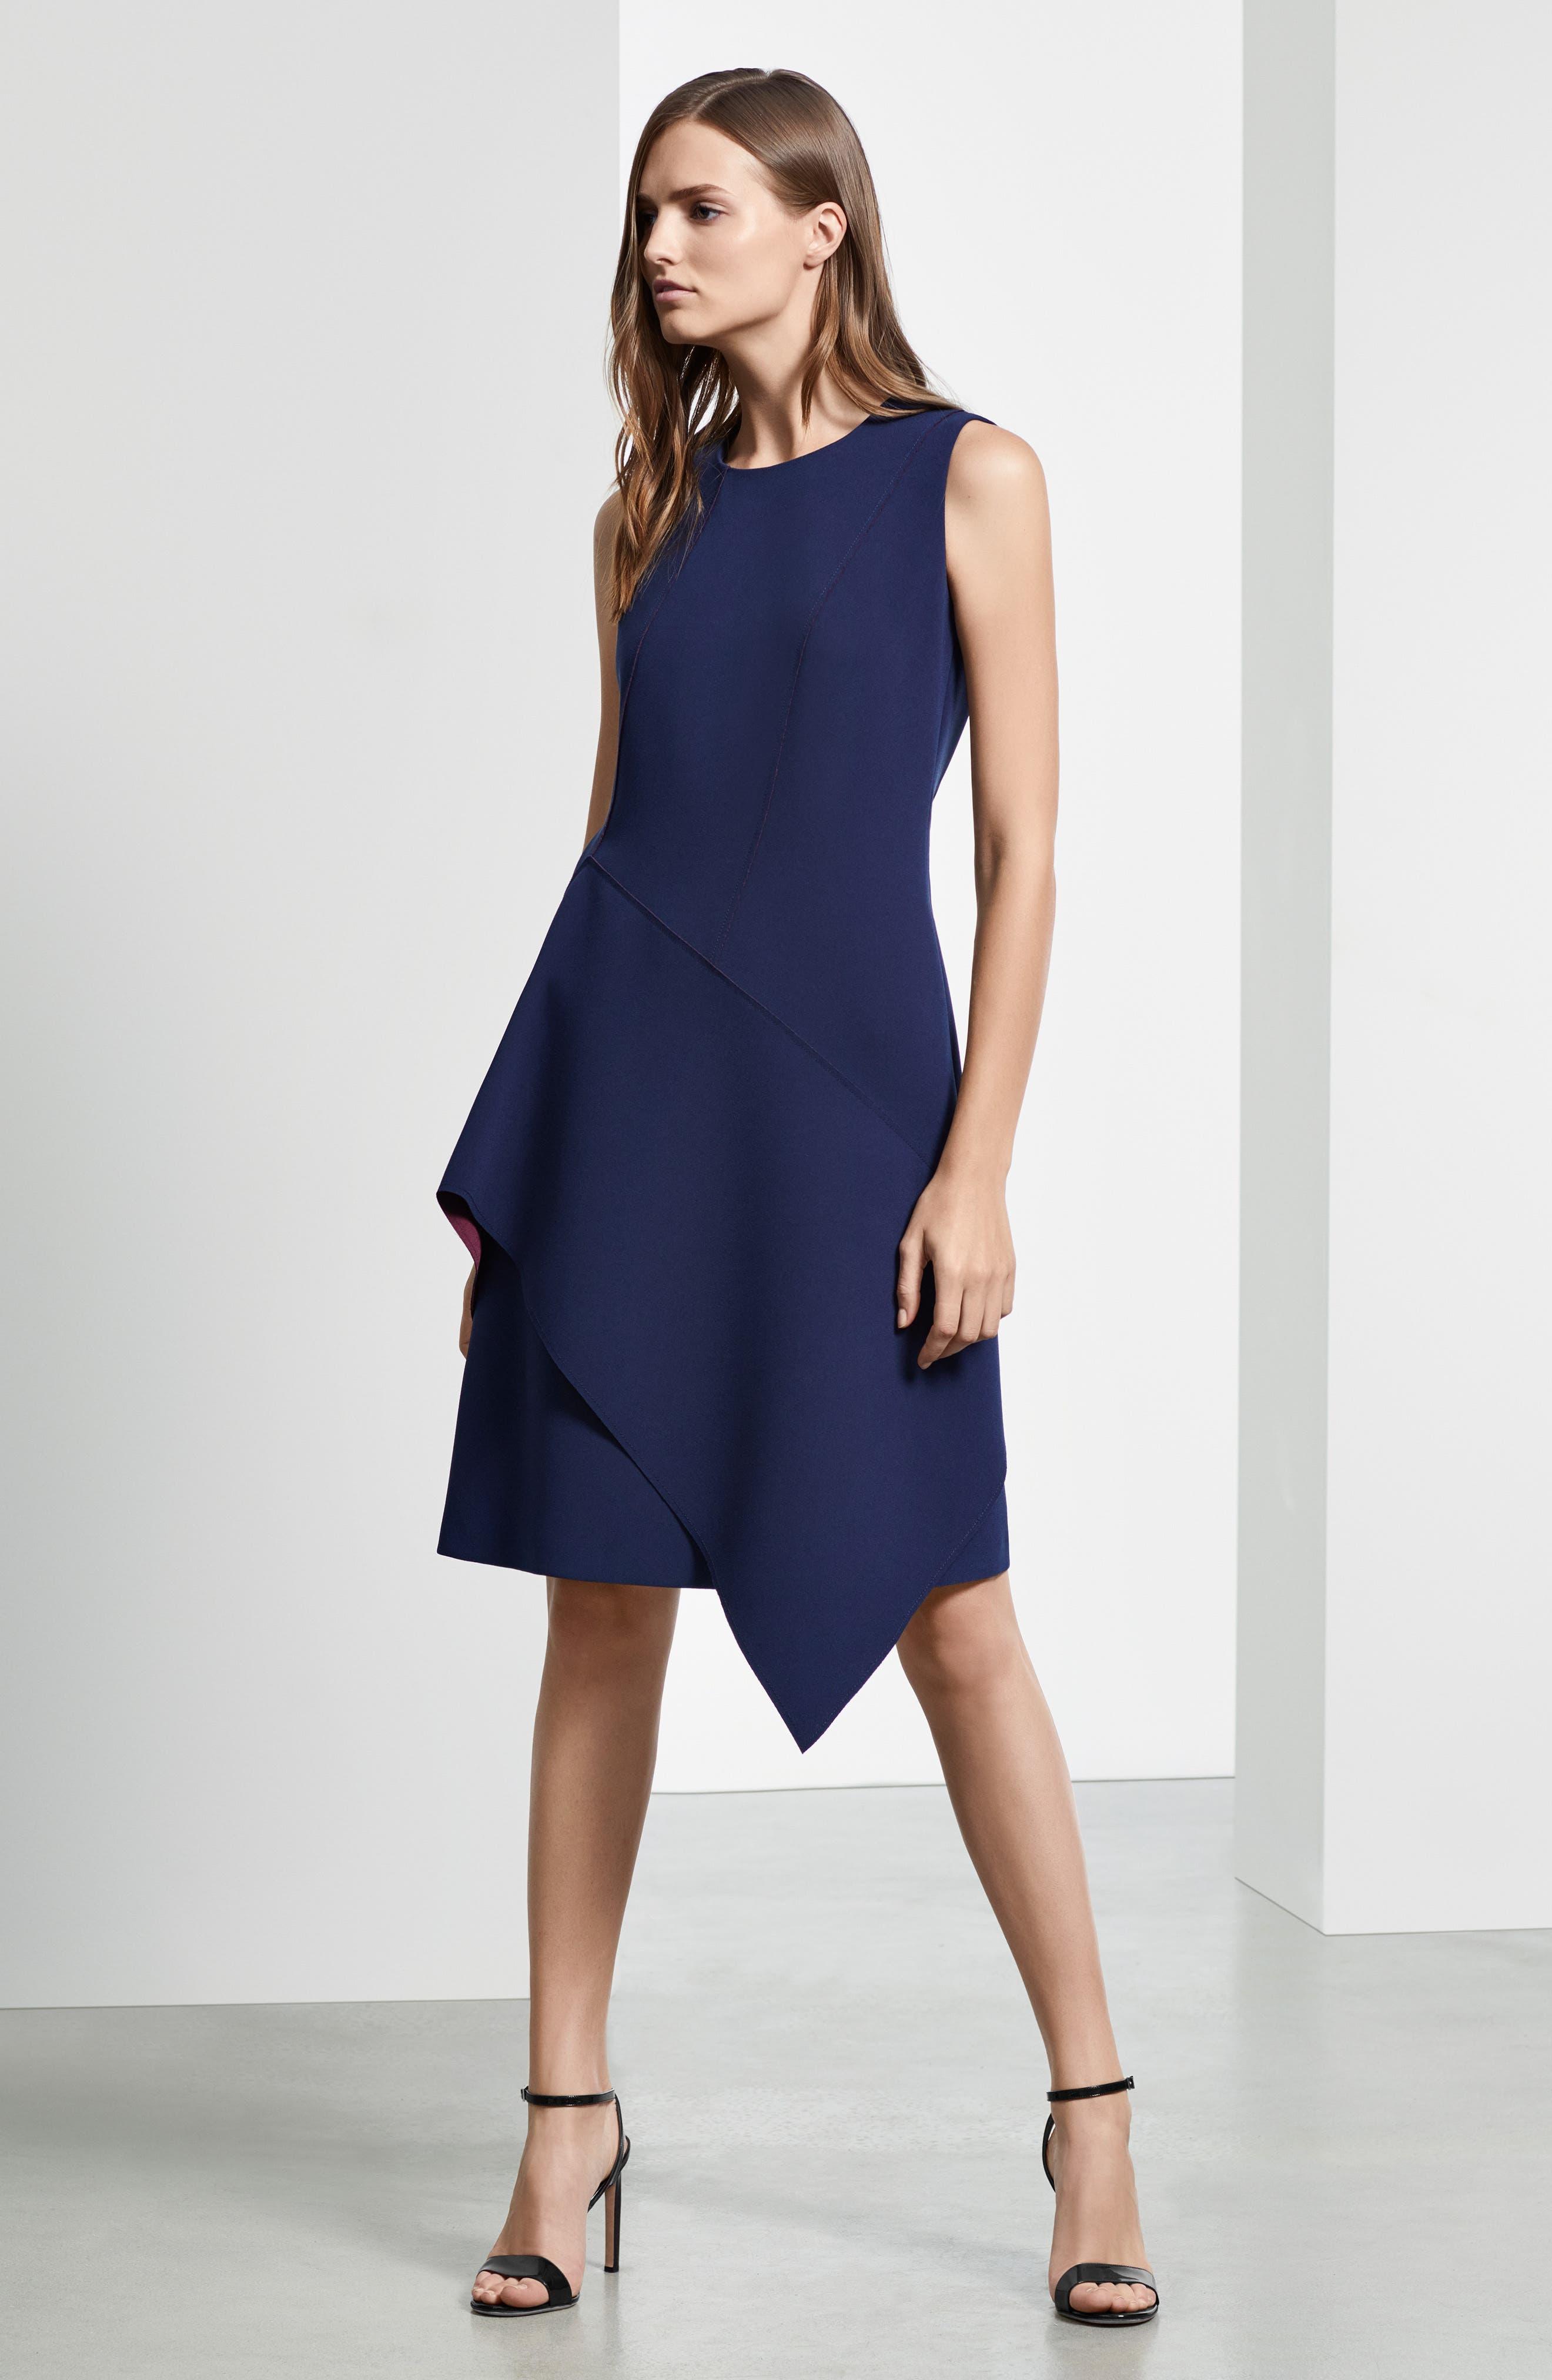 Delakety Asymmetrical A-Line Dress,                             Alternate thumbnail 10, color,                             DEEP BLUE FANTASY